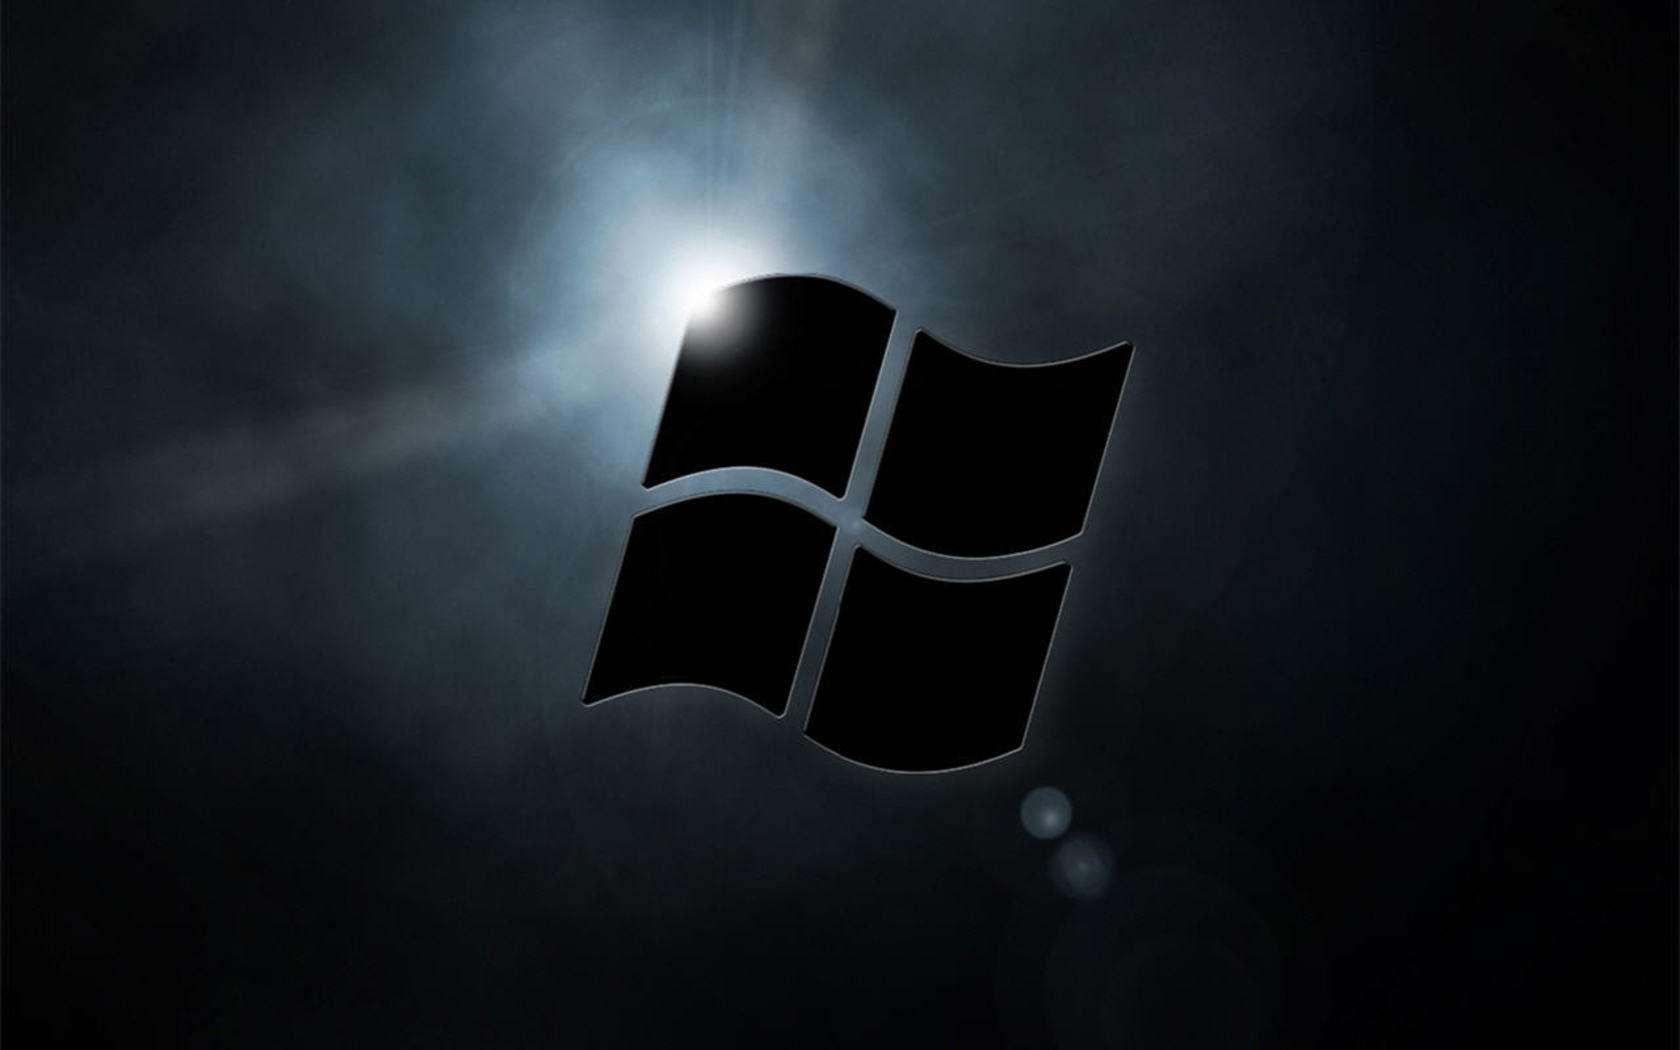 Fondo De Pantalla De Xp En Hd: Windows XP HD Wallpaper